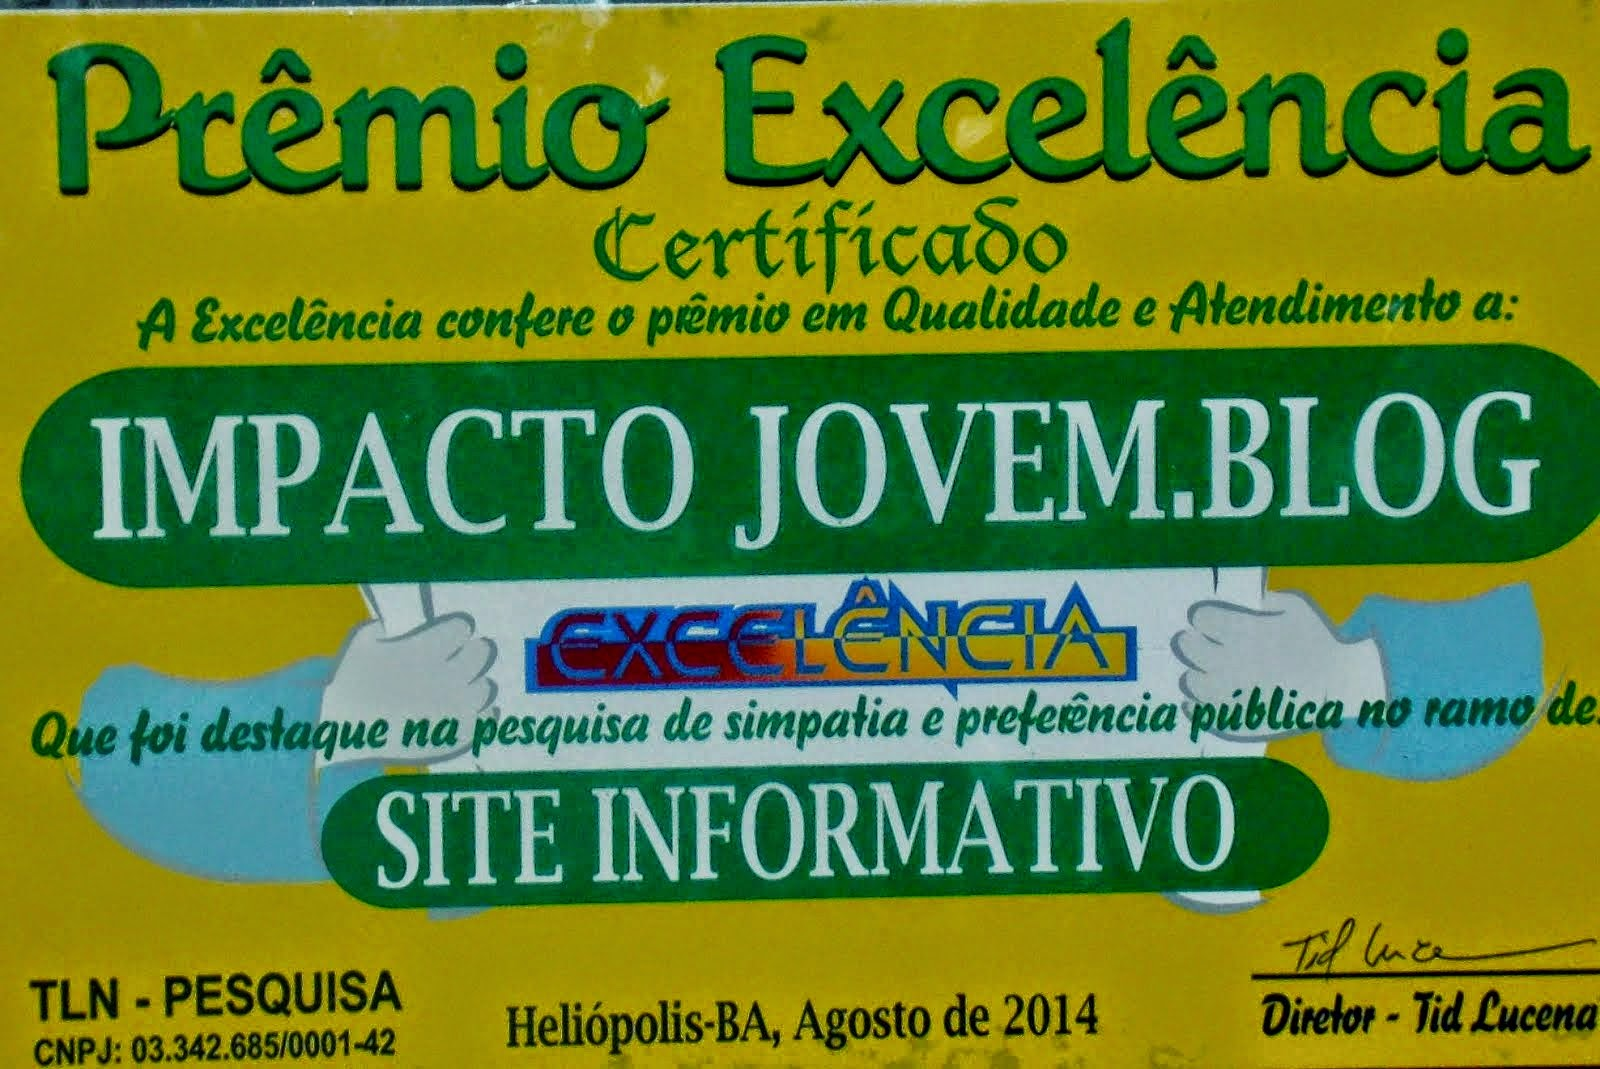 Parabéns, Jorge Souza!